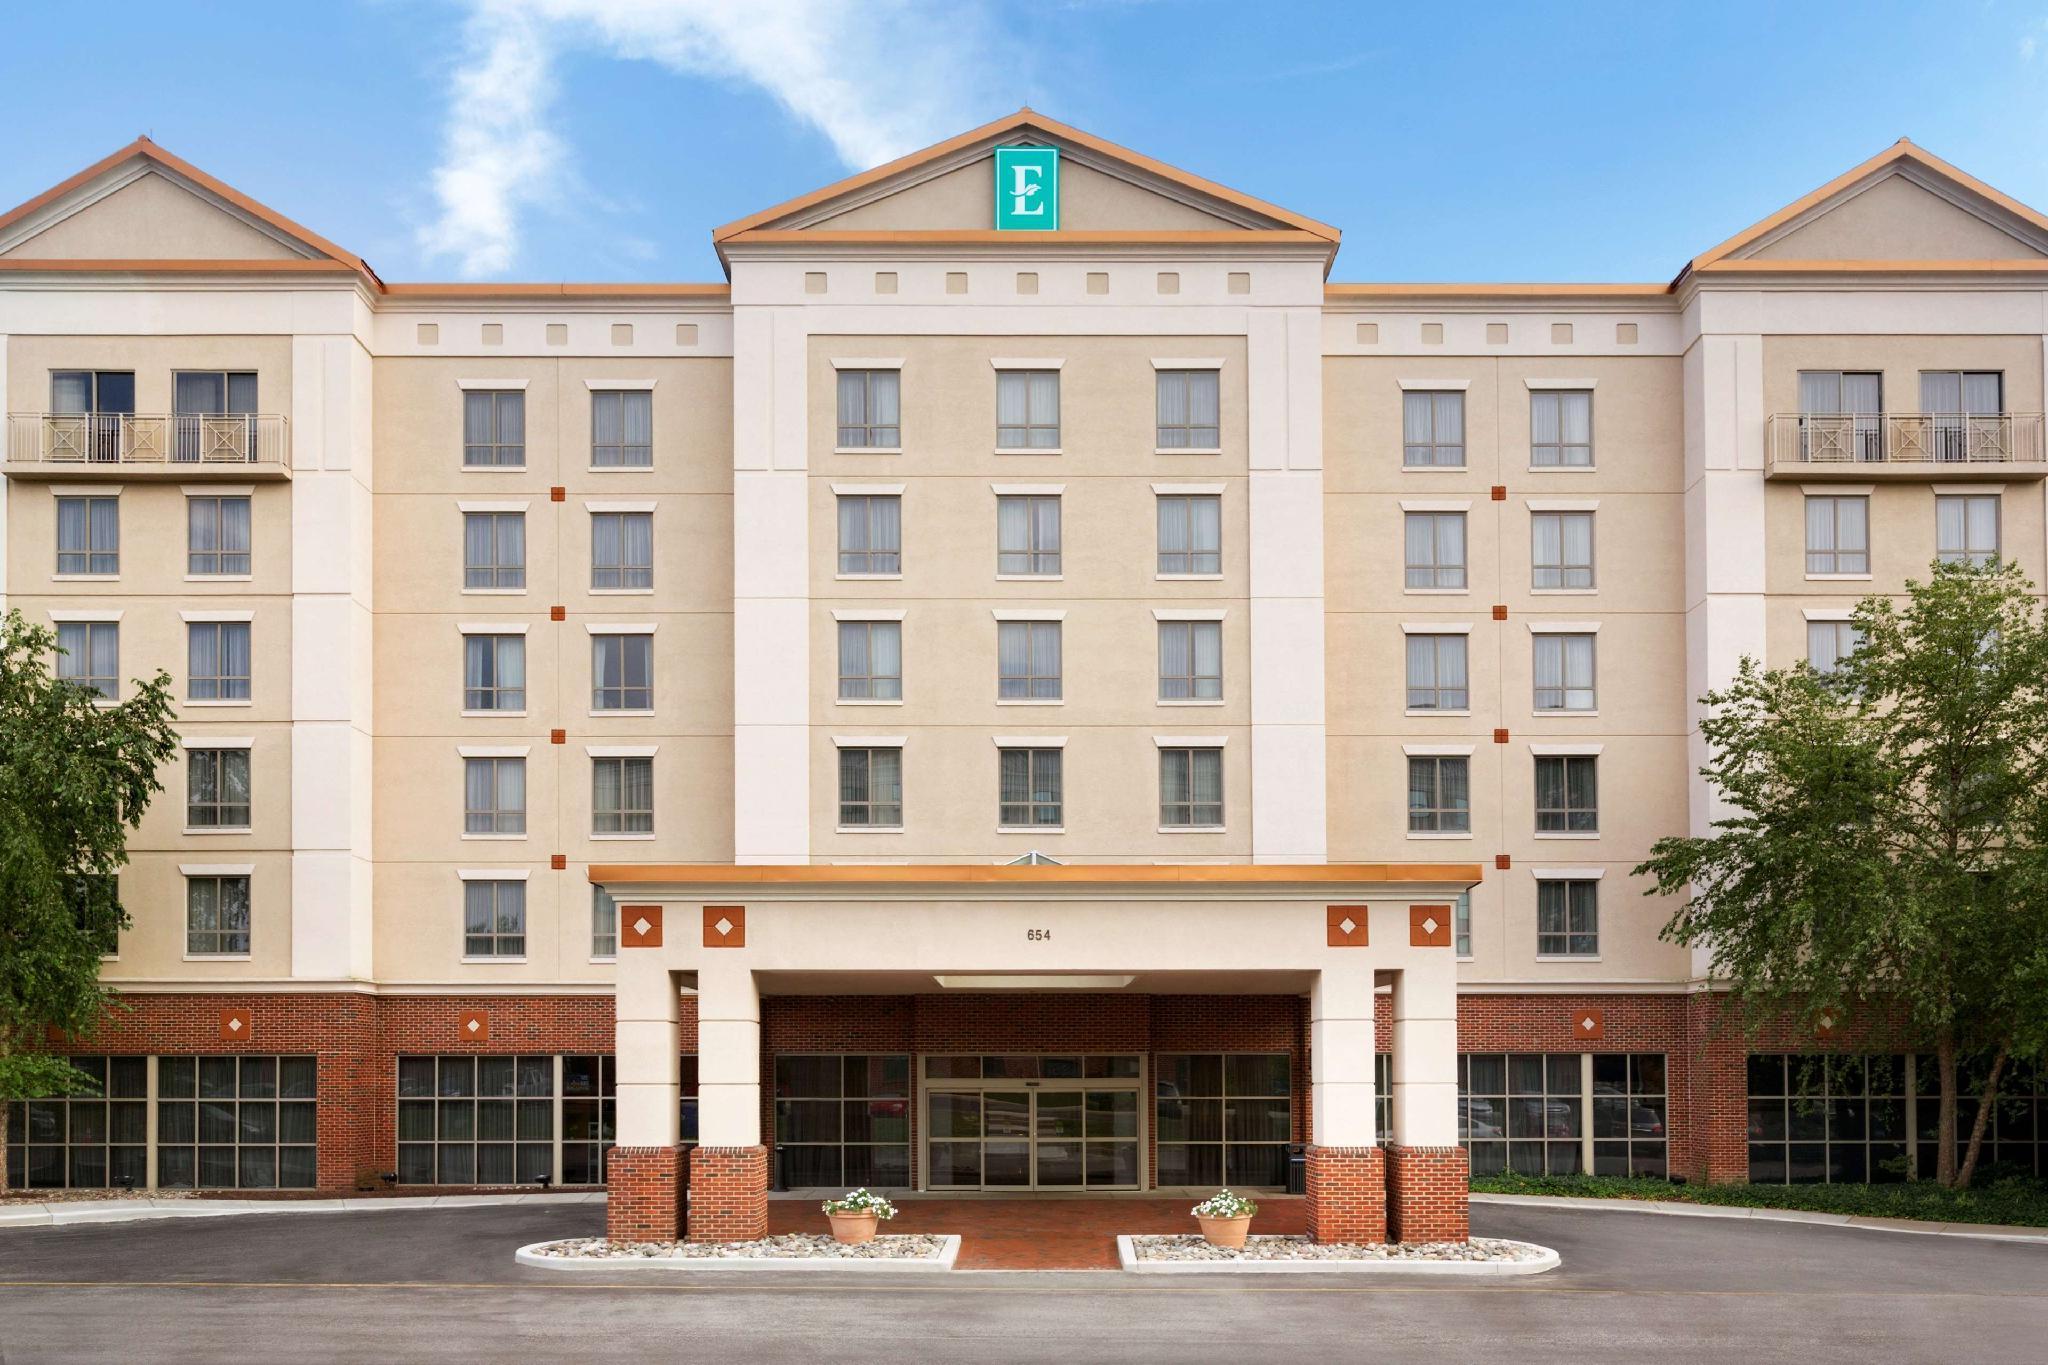 Embassy Suites Newark Wilmington South